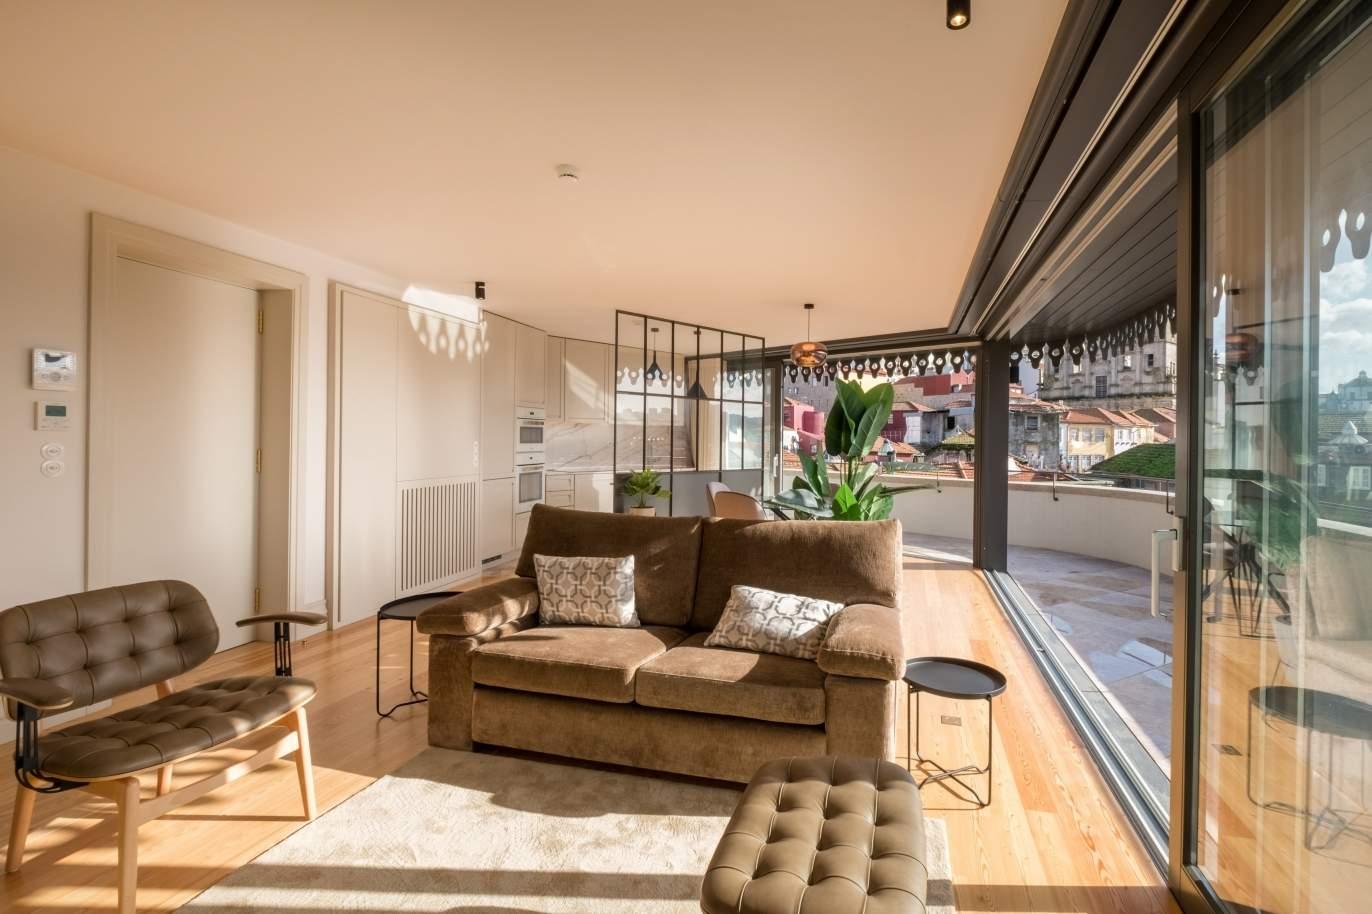 venda-de-penthouse-de-luxo-na-baixa-do-porto-portugal